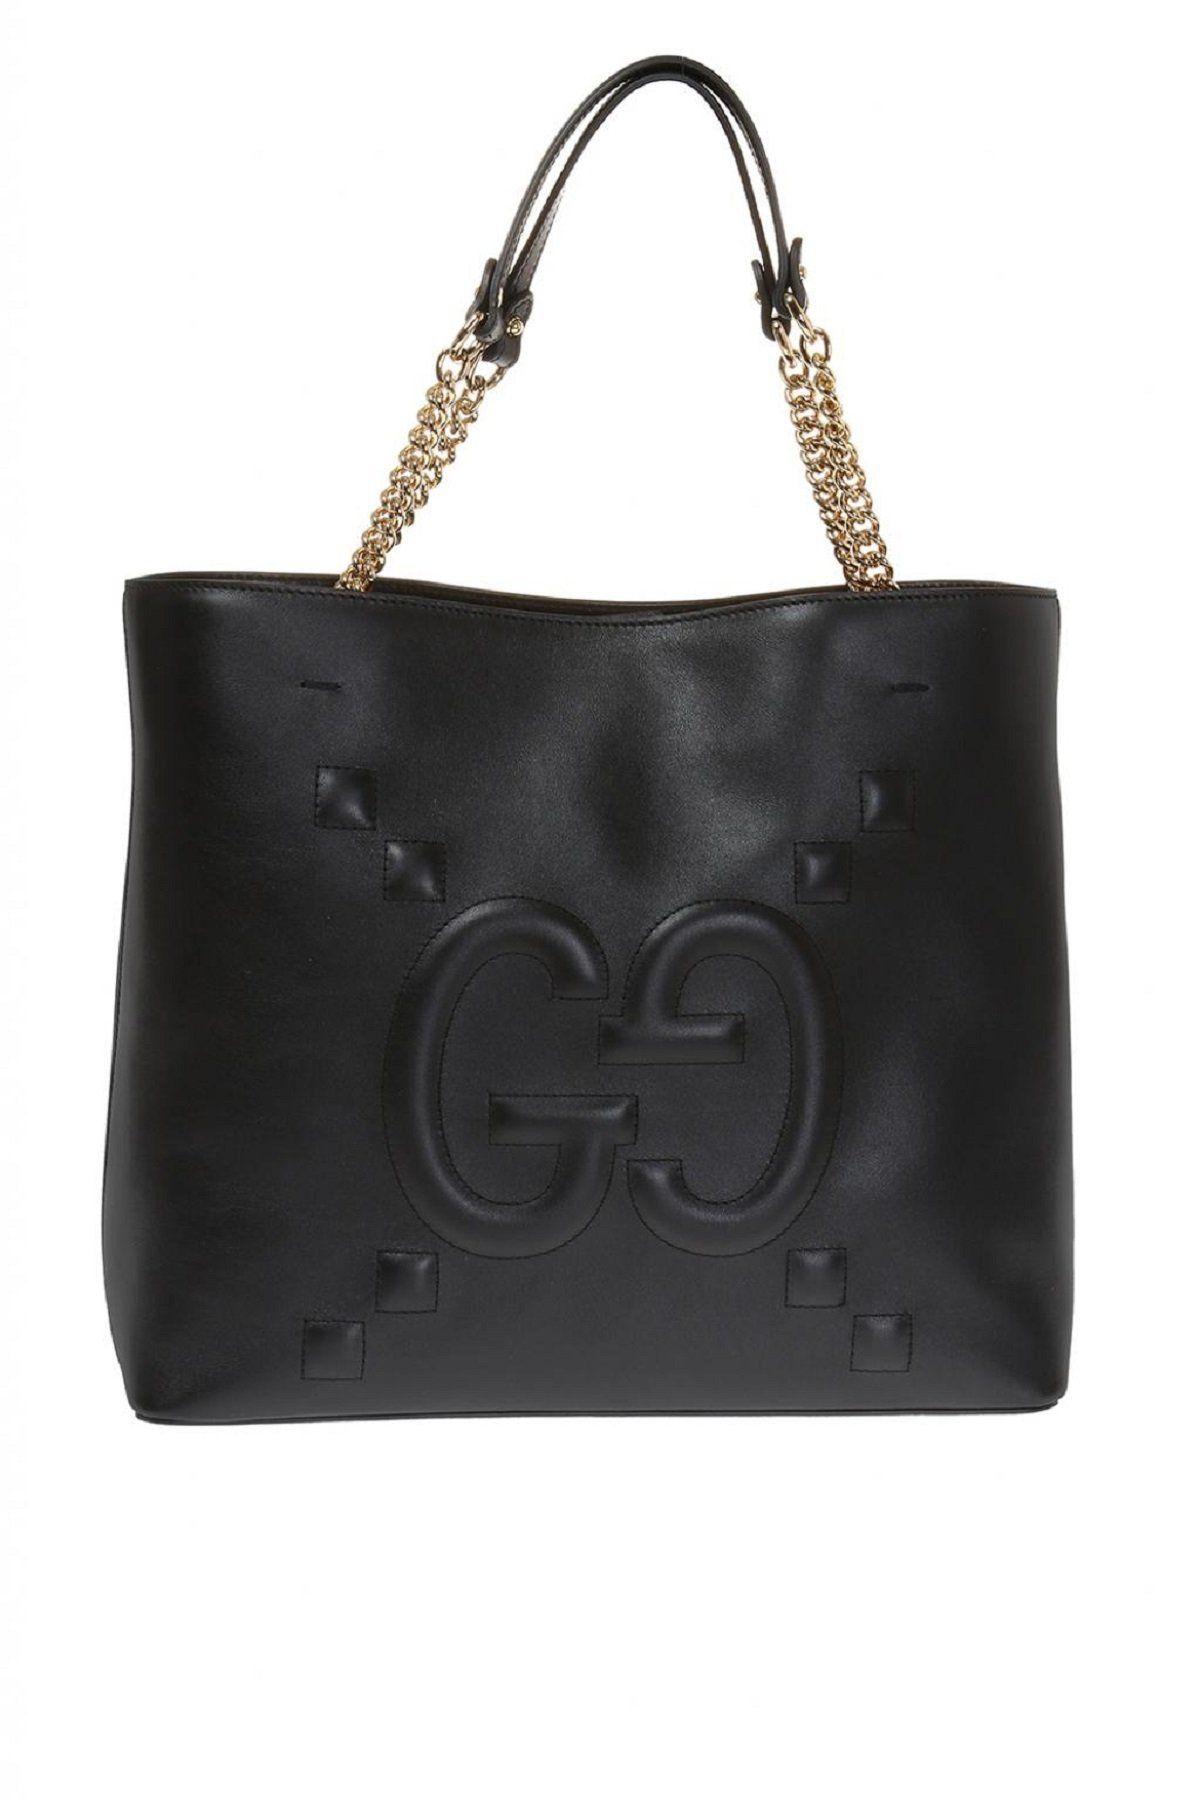 8c8de65df49 Gucci new jackie shoulder bag   Gucci Purse   Leather shoulder bag ...